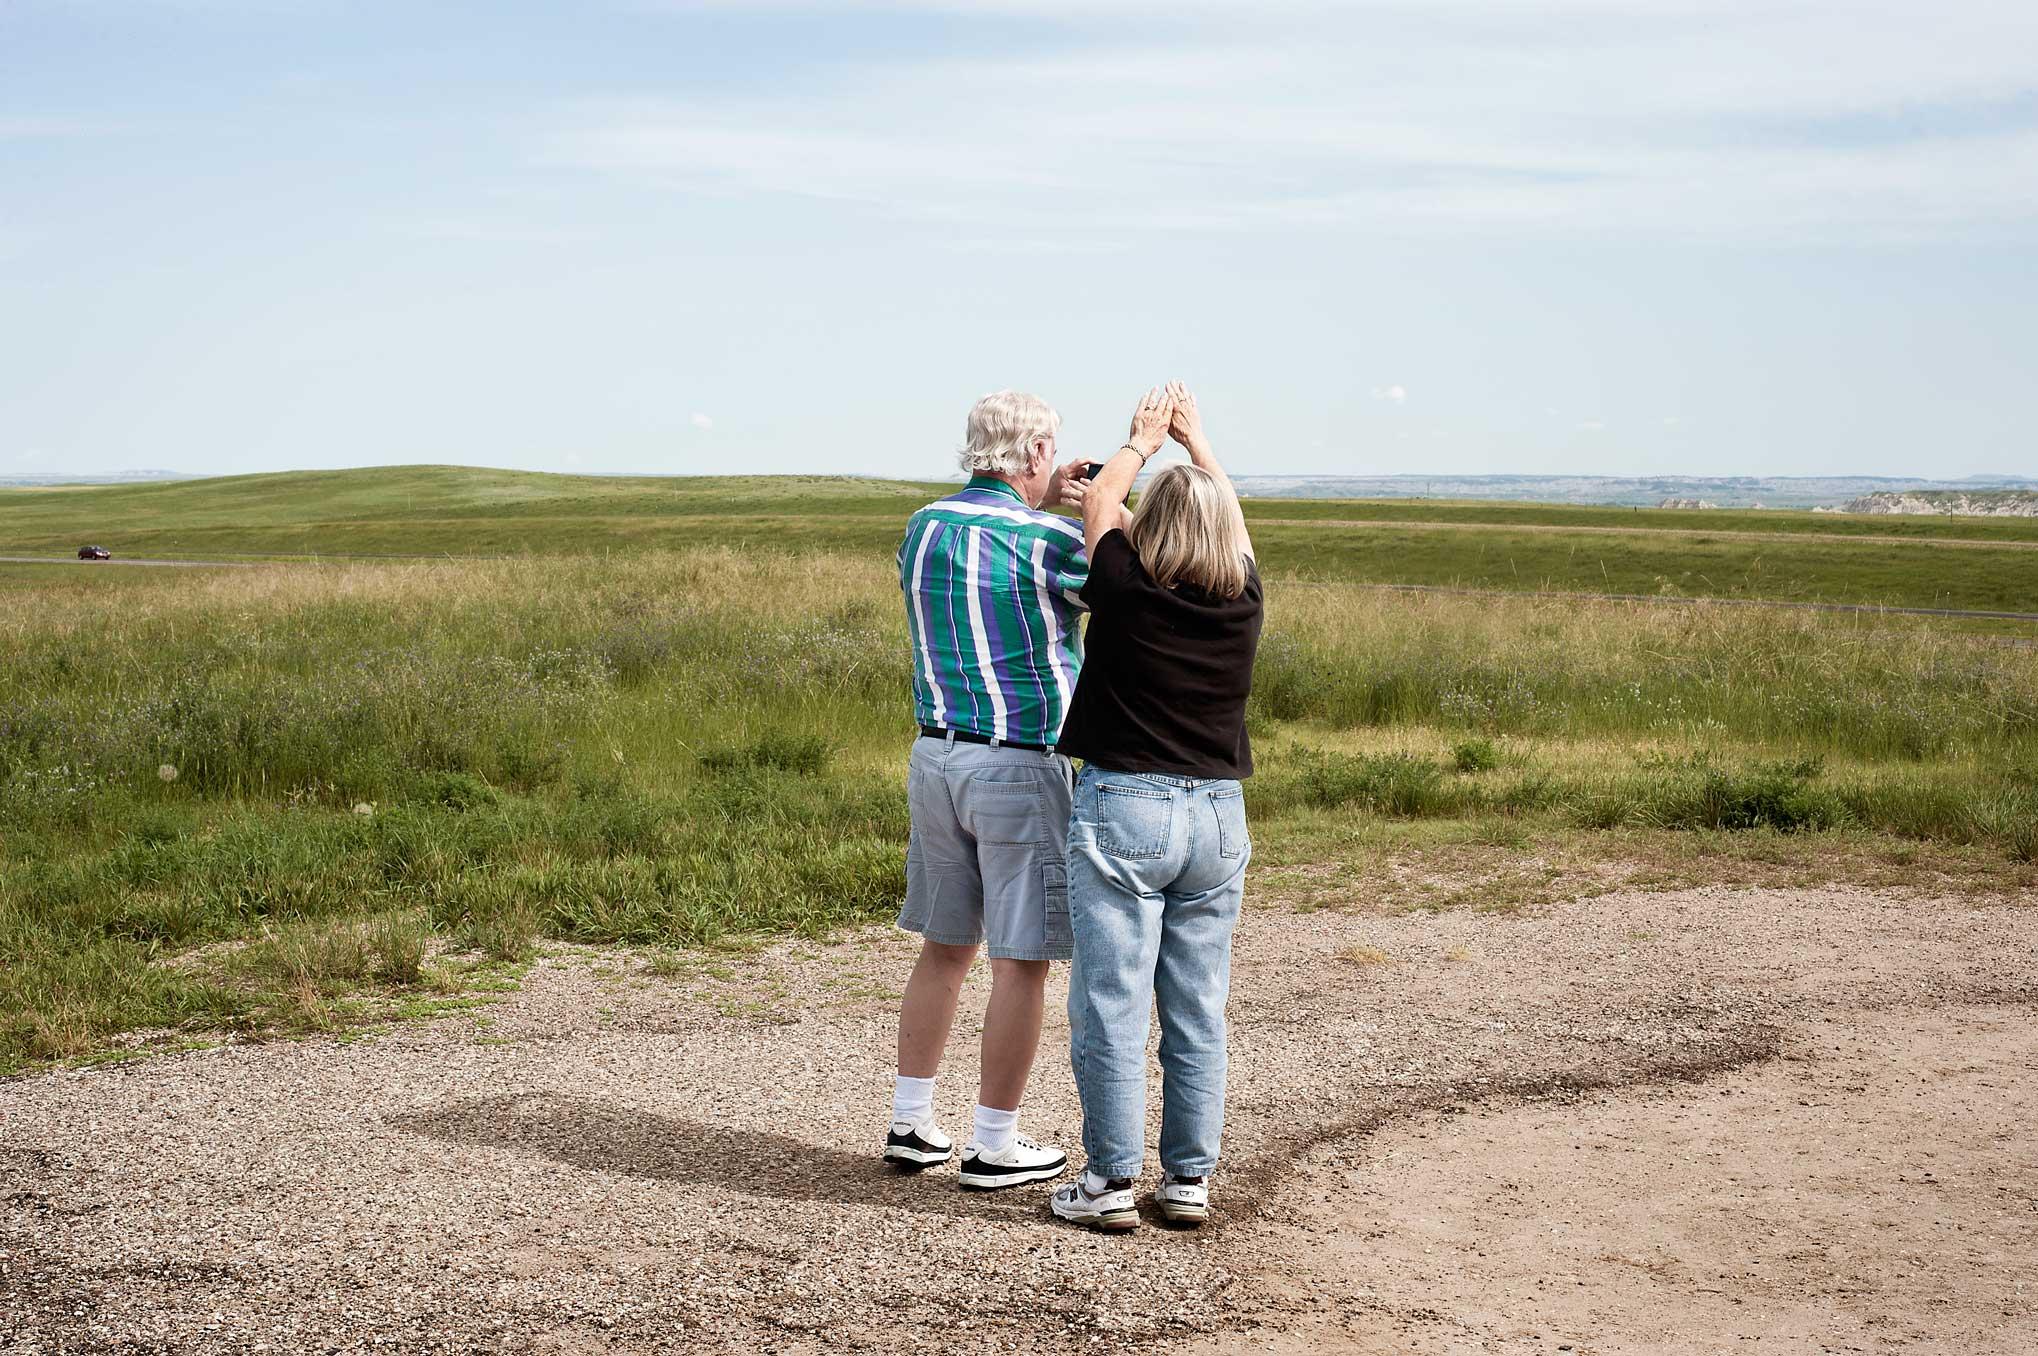 Badlands South Dakota, USA